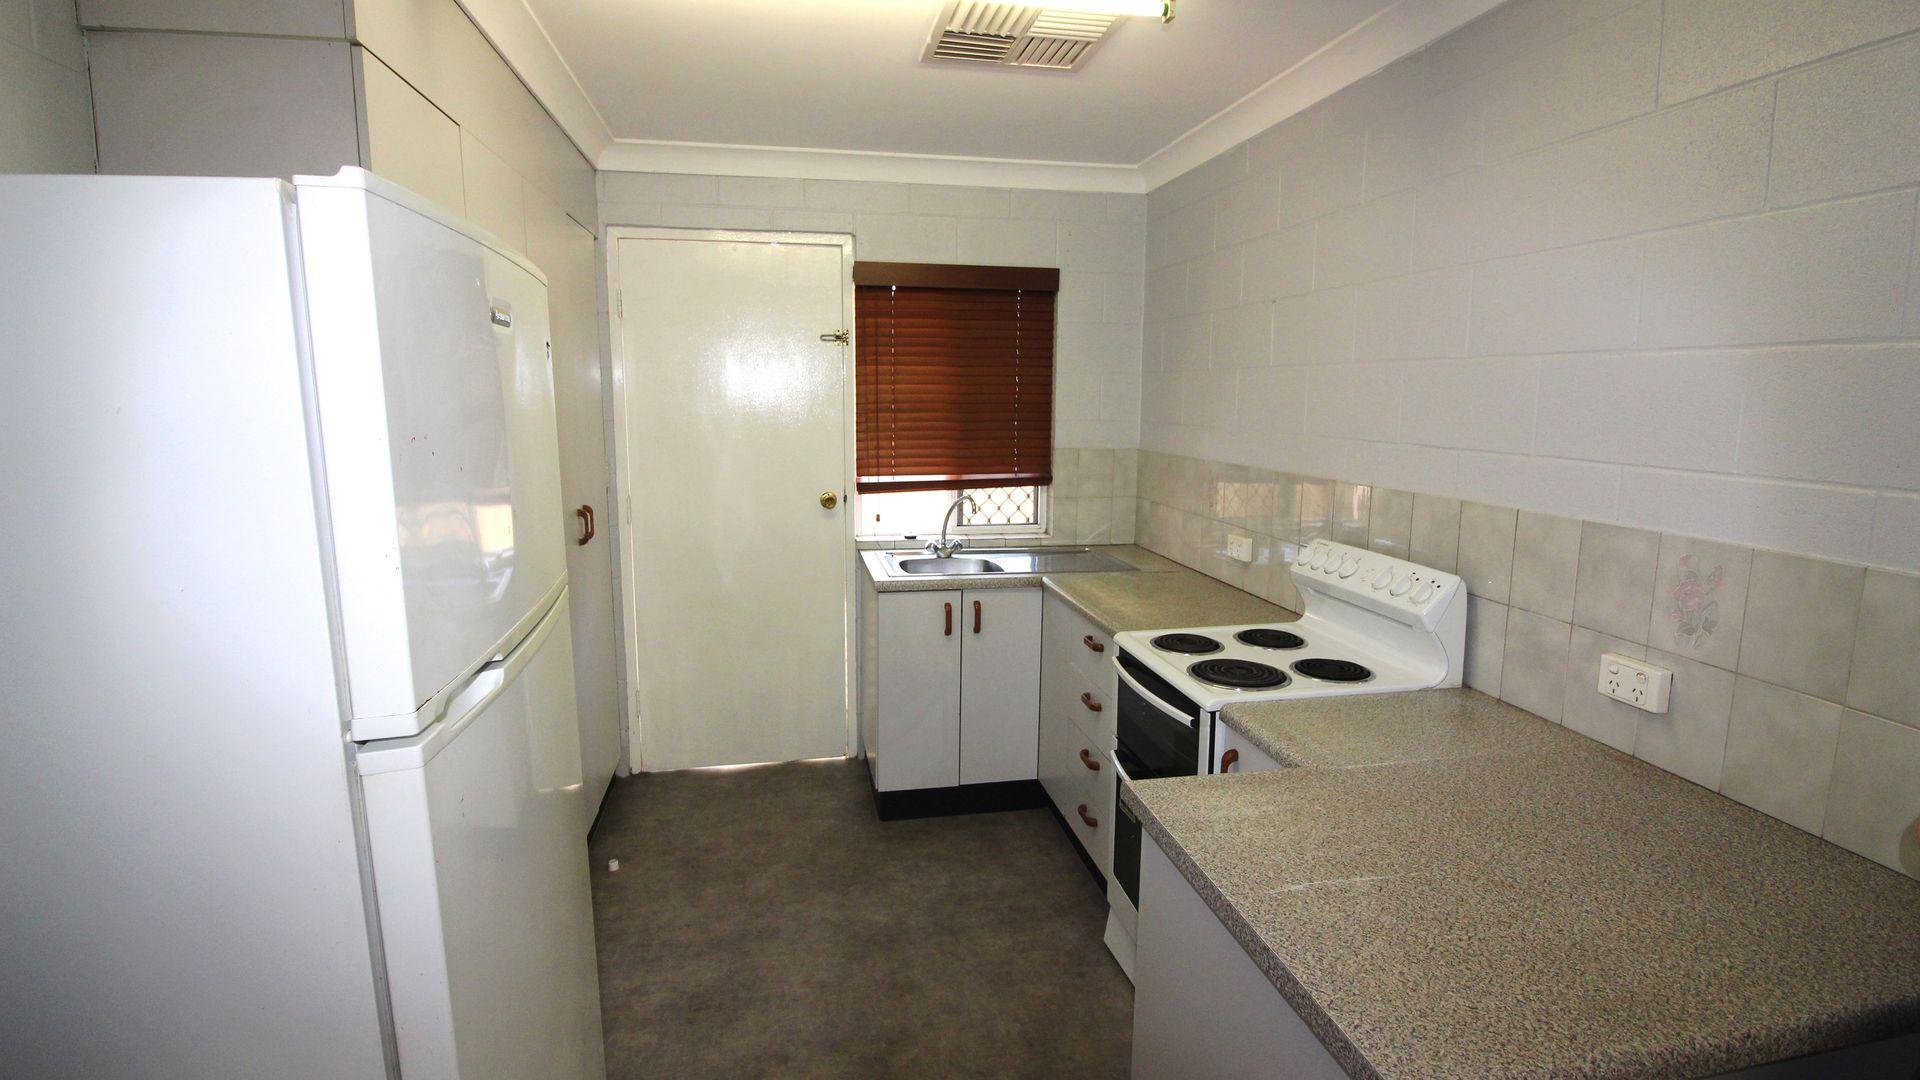 Unit 2/21 Duchess Rd, Mount Isa QLD 4825, Image 1